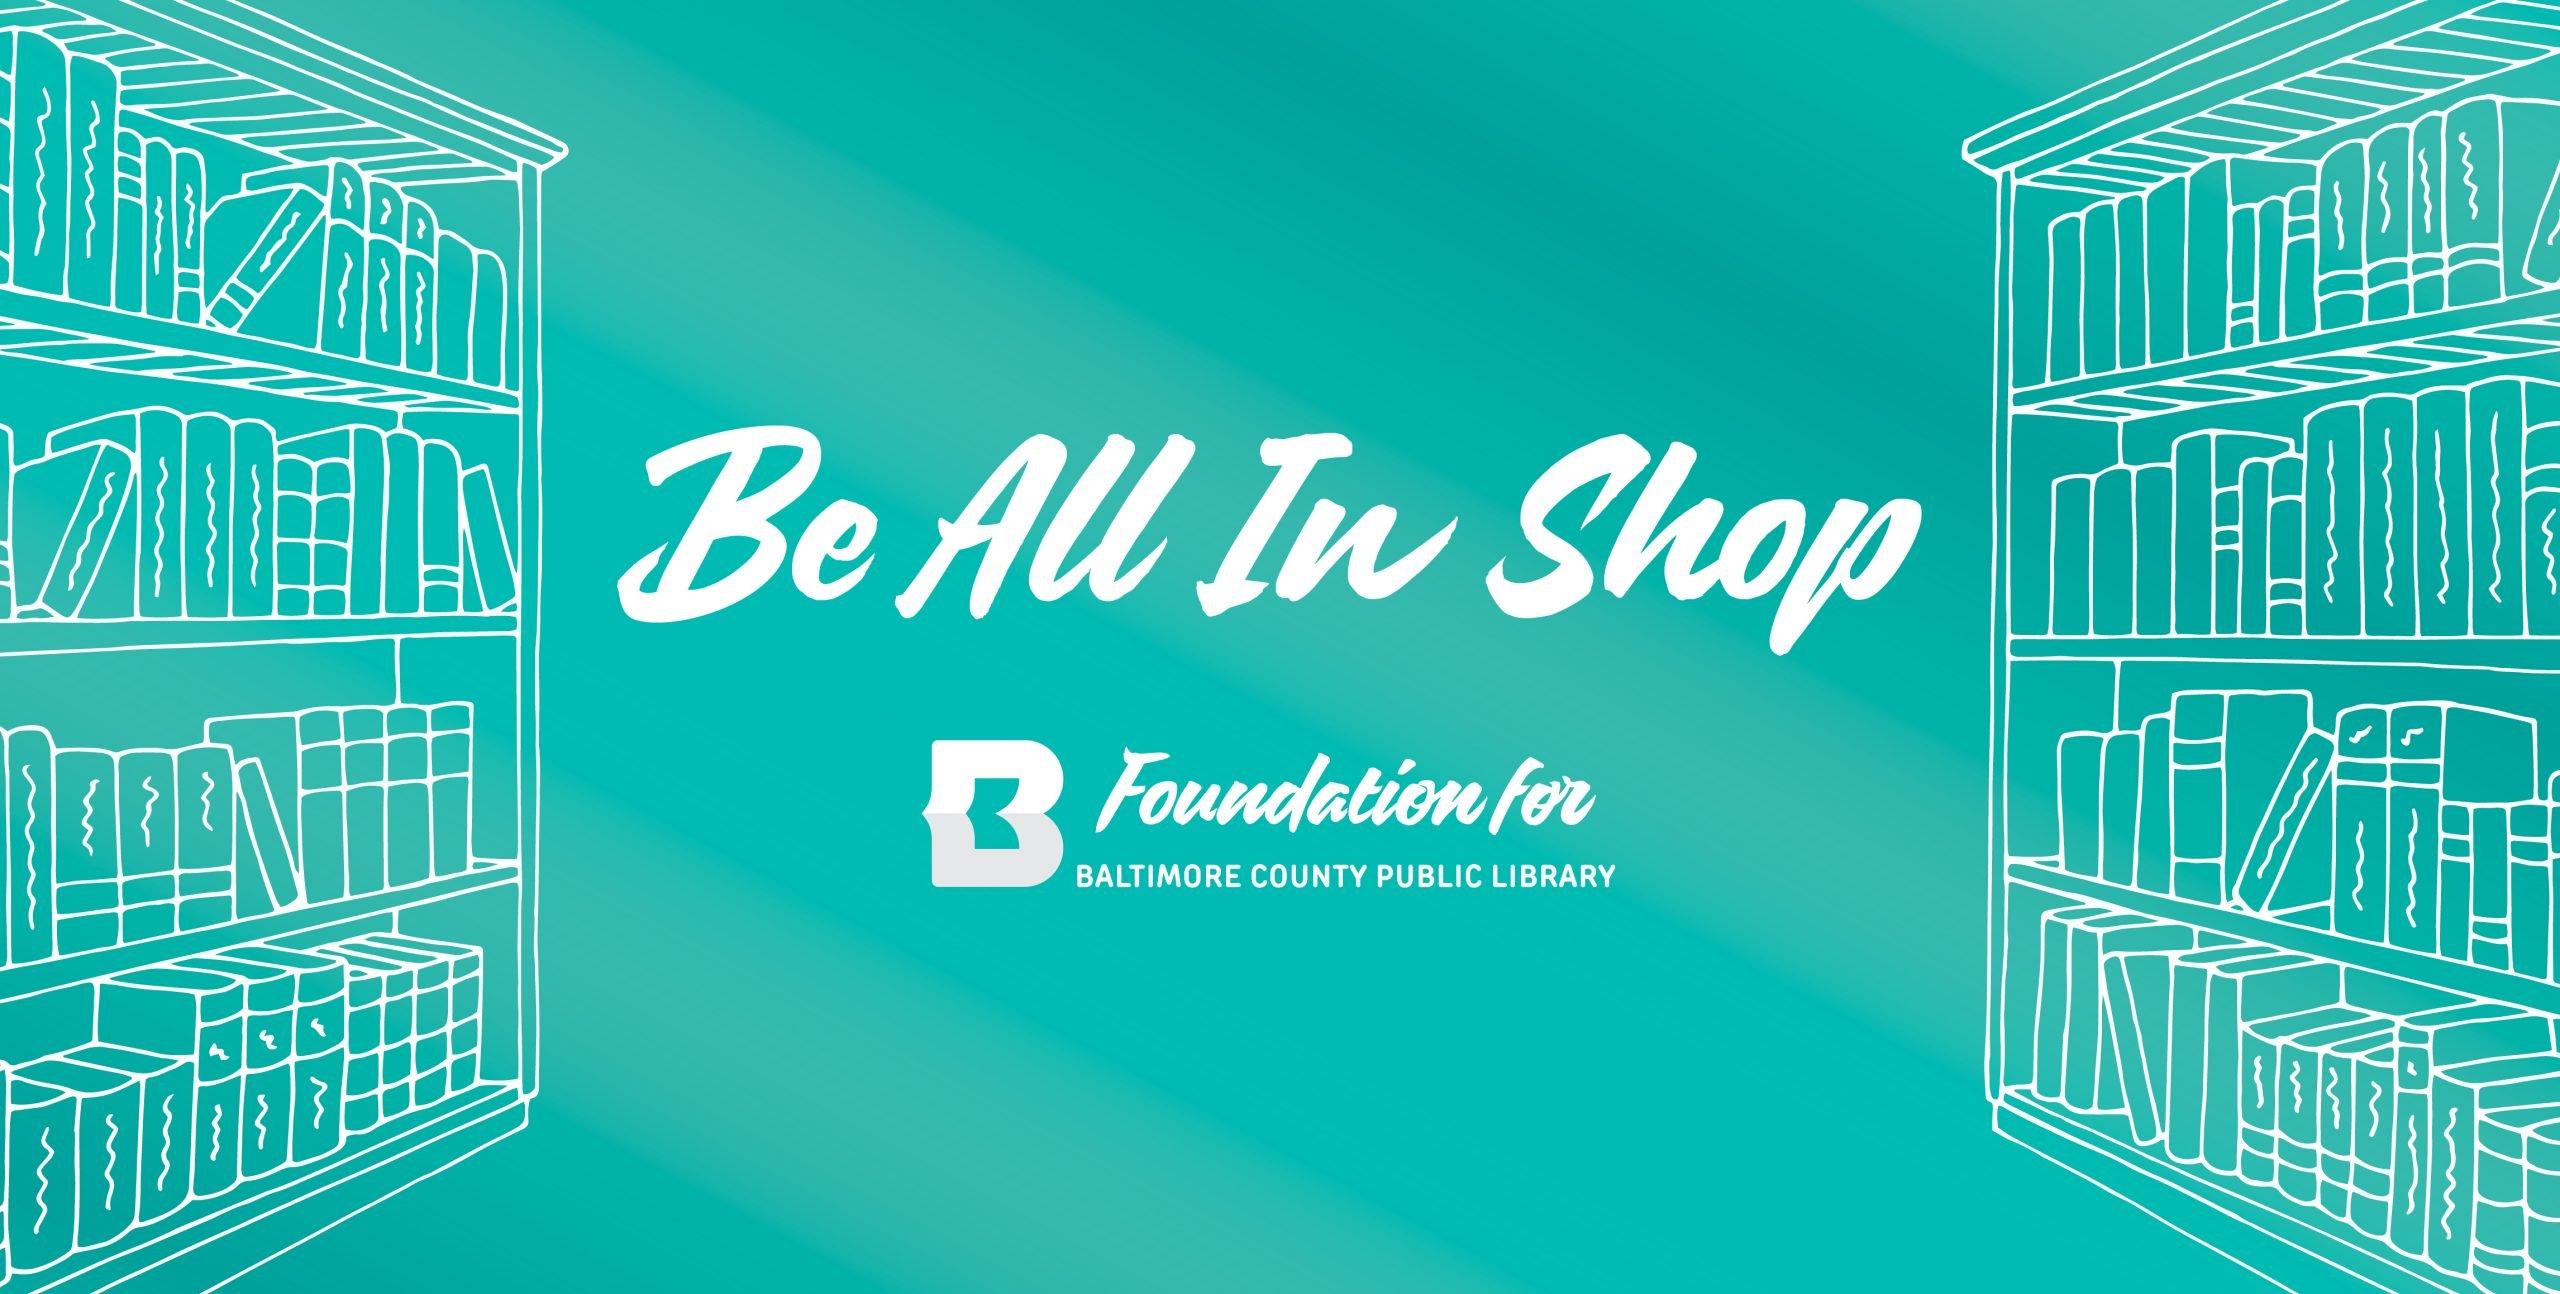 Foundation_Etsy_Banner_website